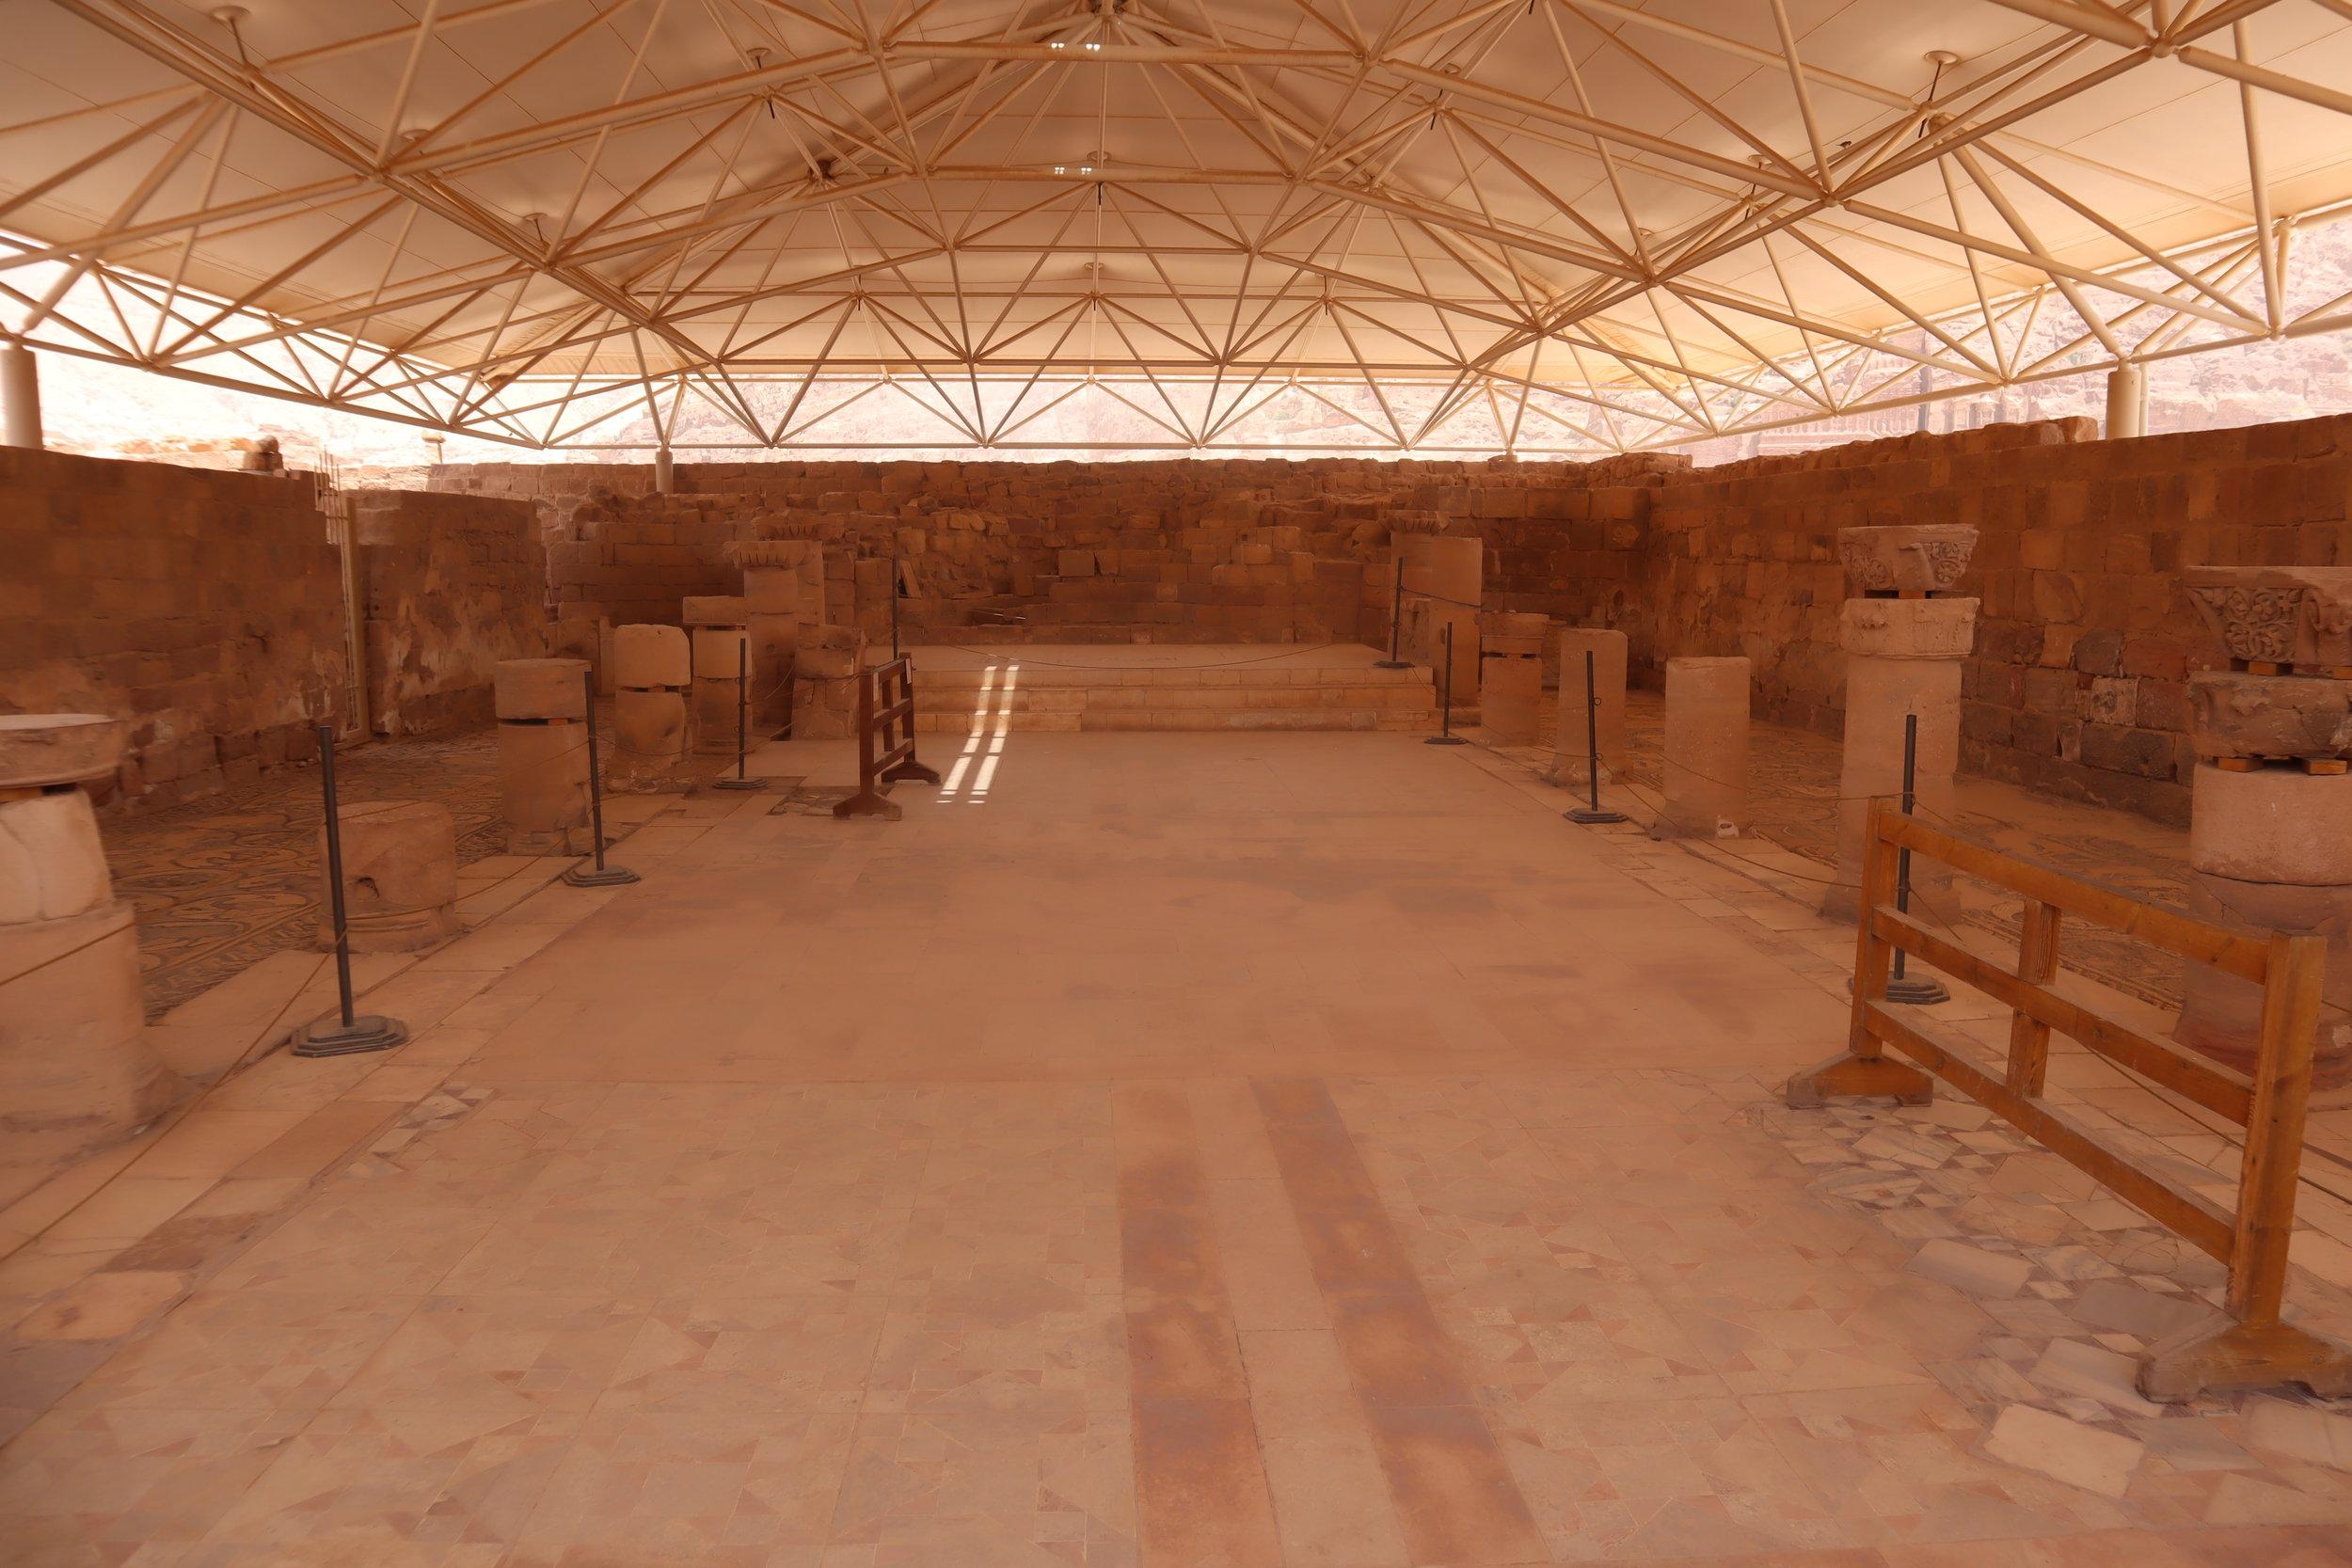 Petra, Jordan – Byzantine Church